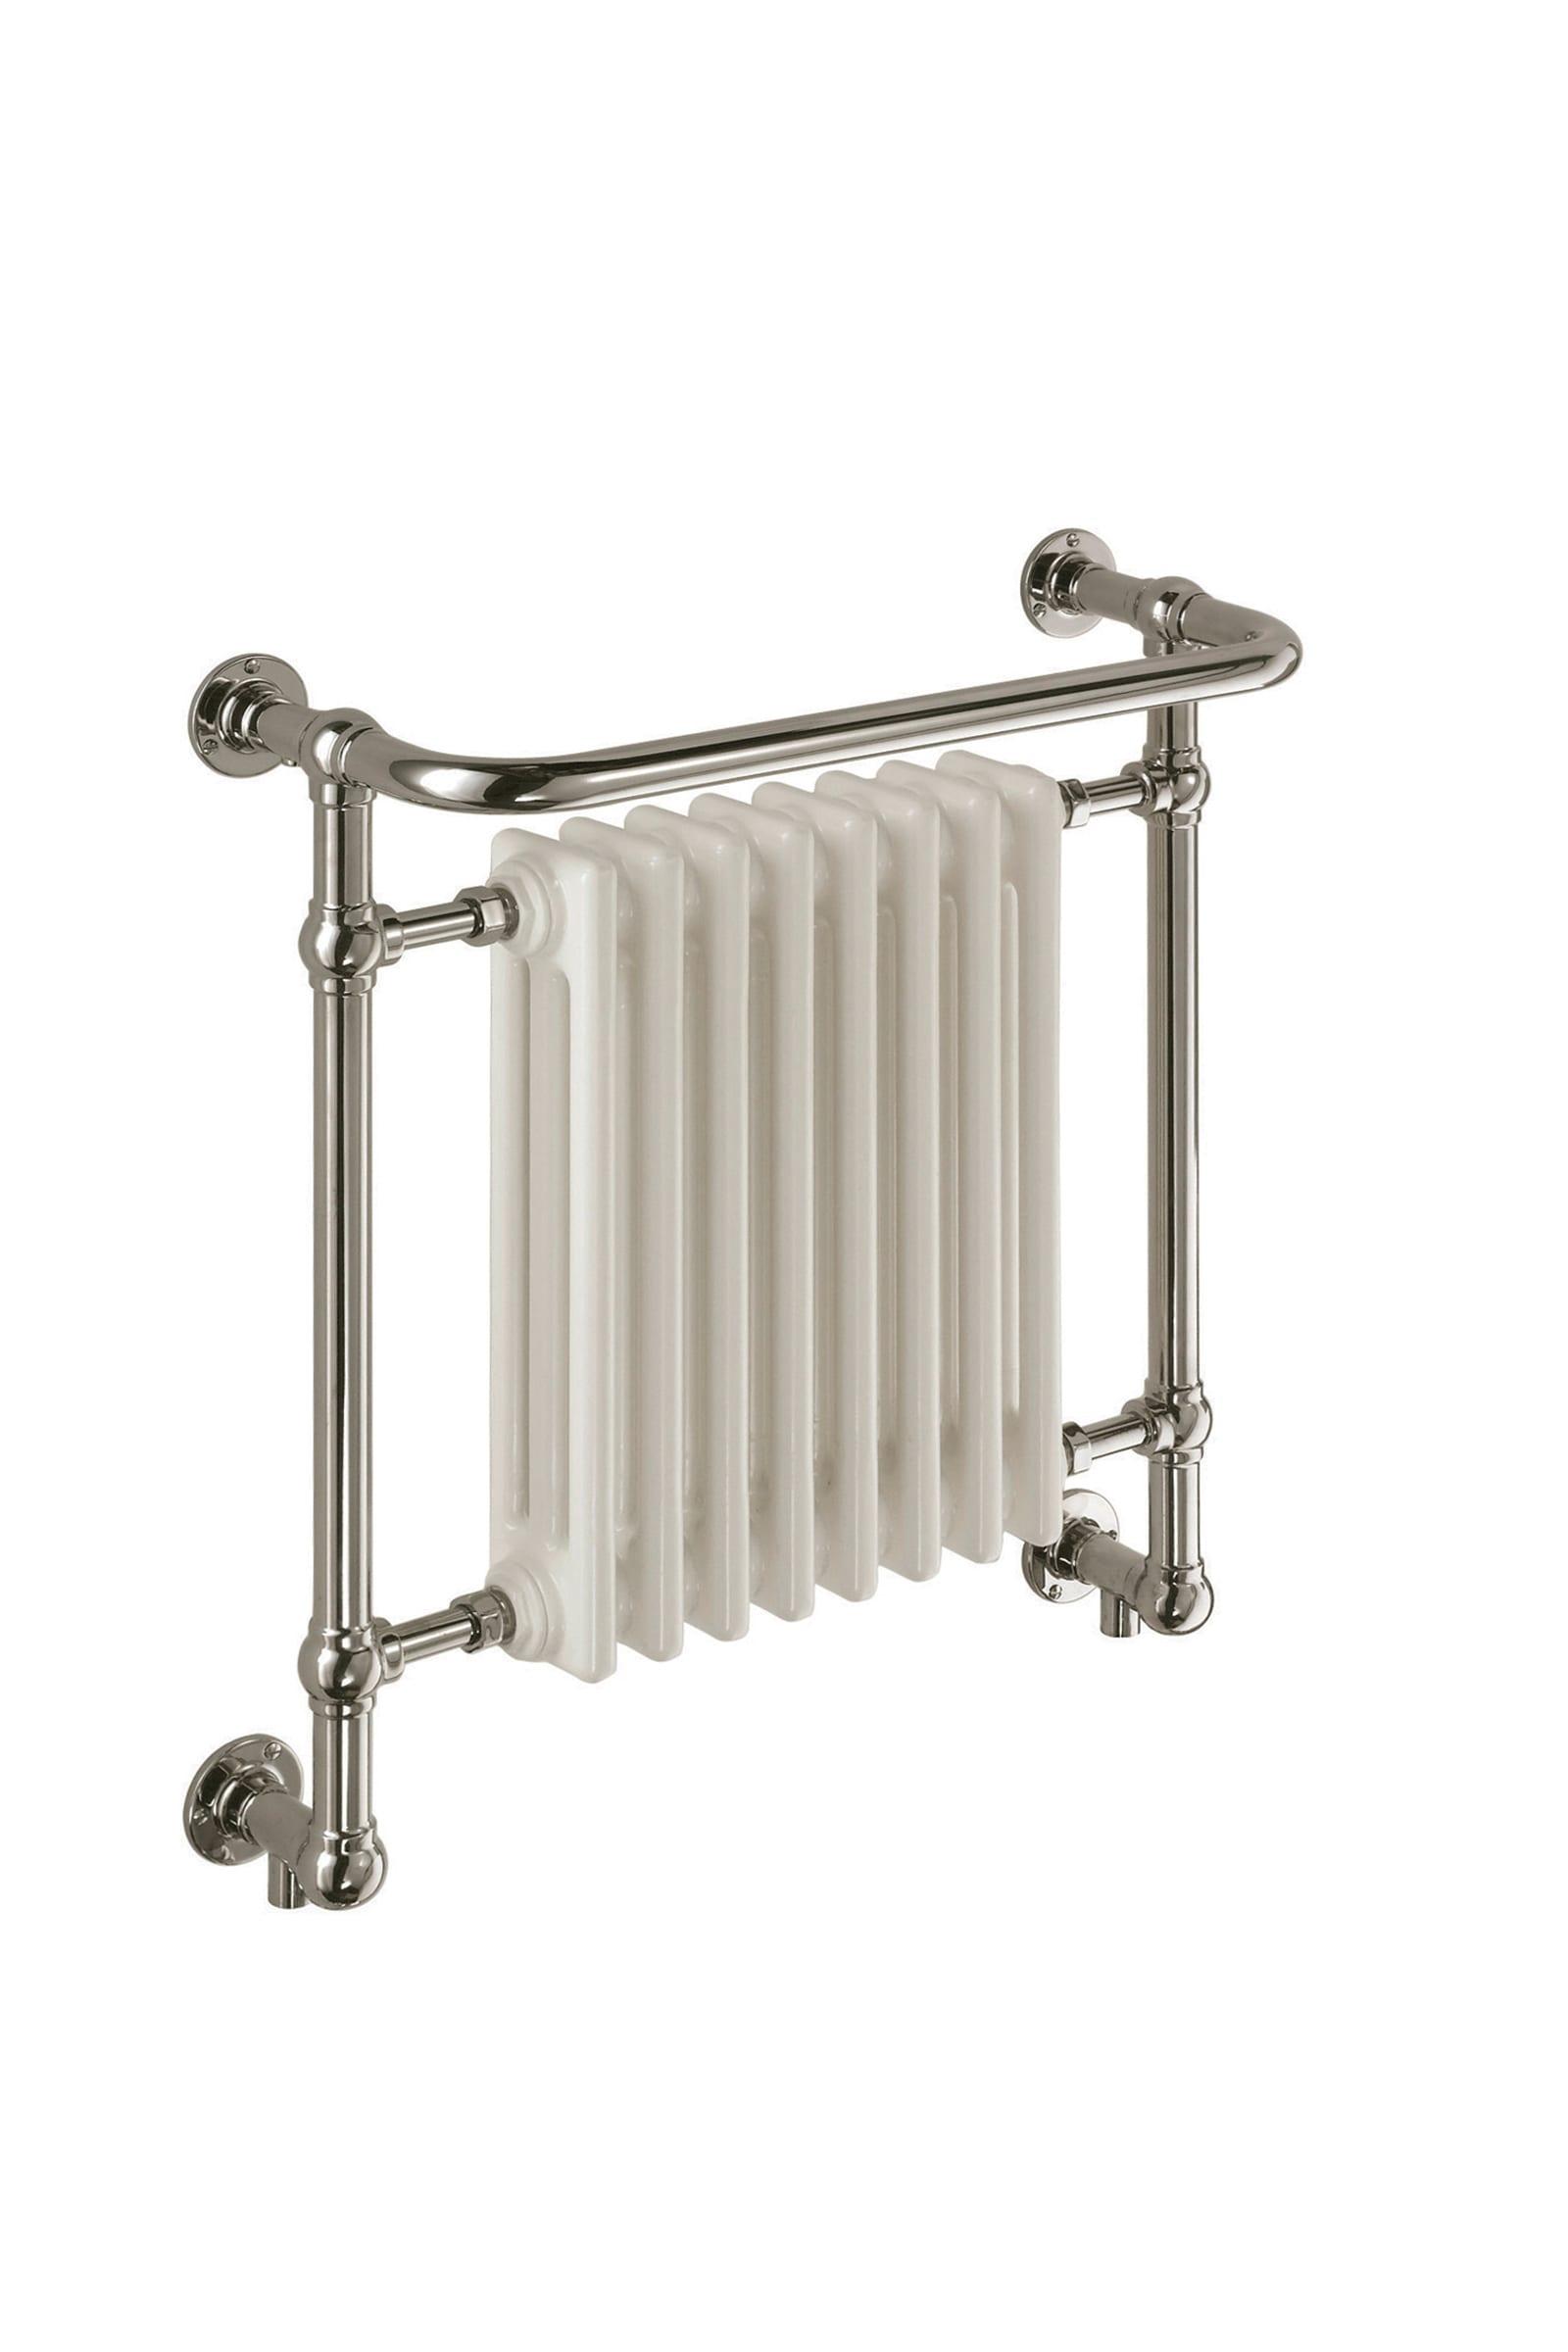 Heated Towel Warmers And Radiators The Albion Bath Co Ltd